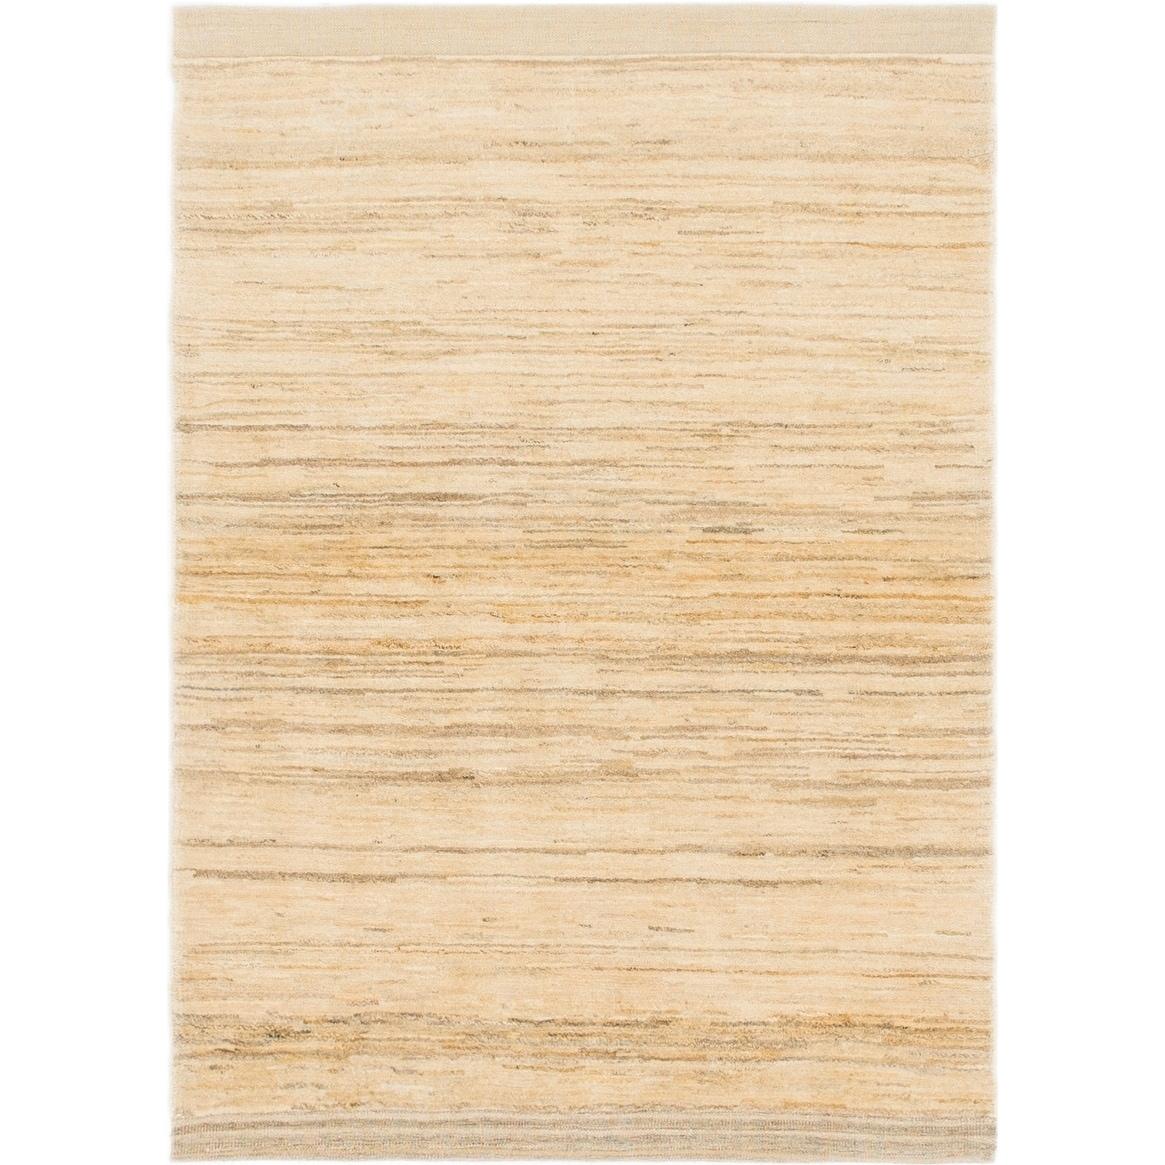 Hand Knotted Kashkuli Gabbeh Wool Area Rug - 3 6 x 4 10 (Gold - 3 6 x 4 10)